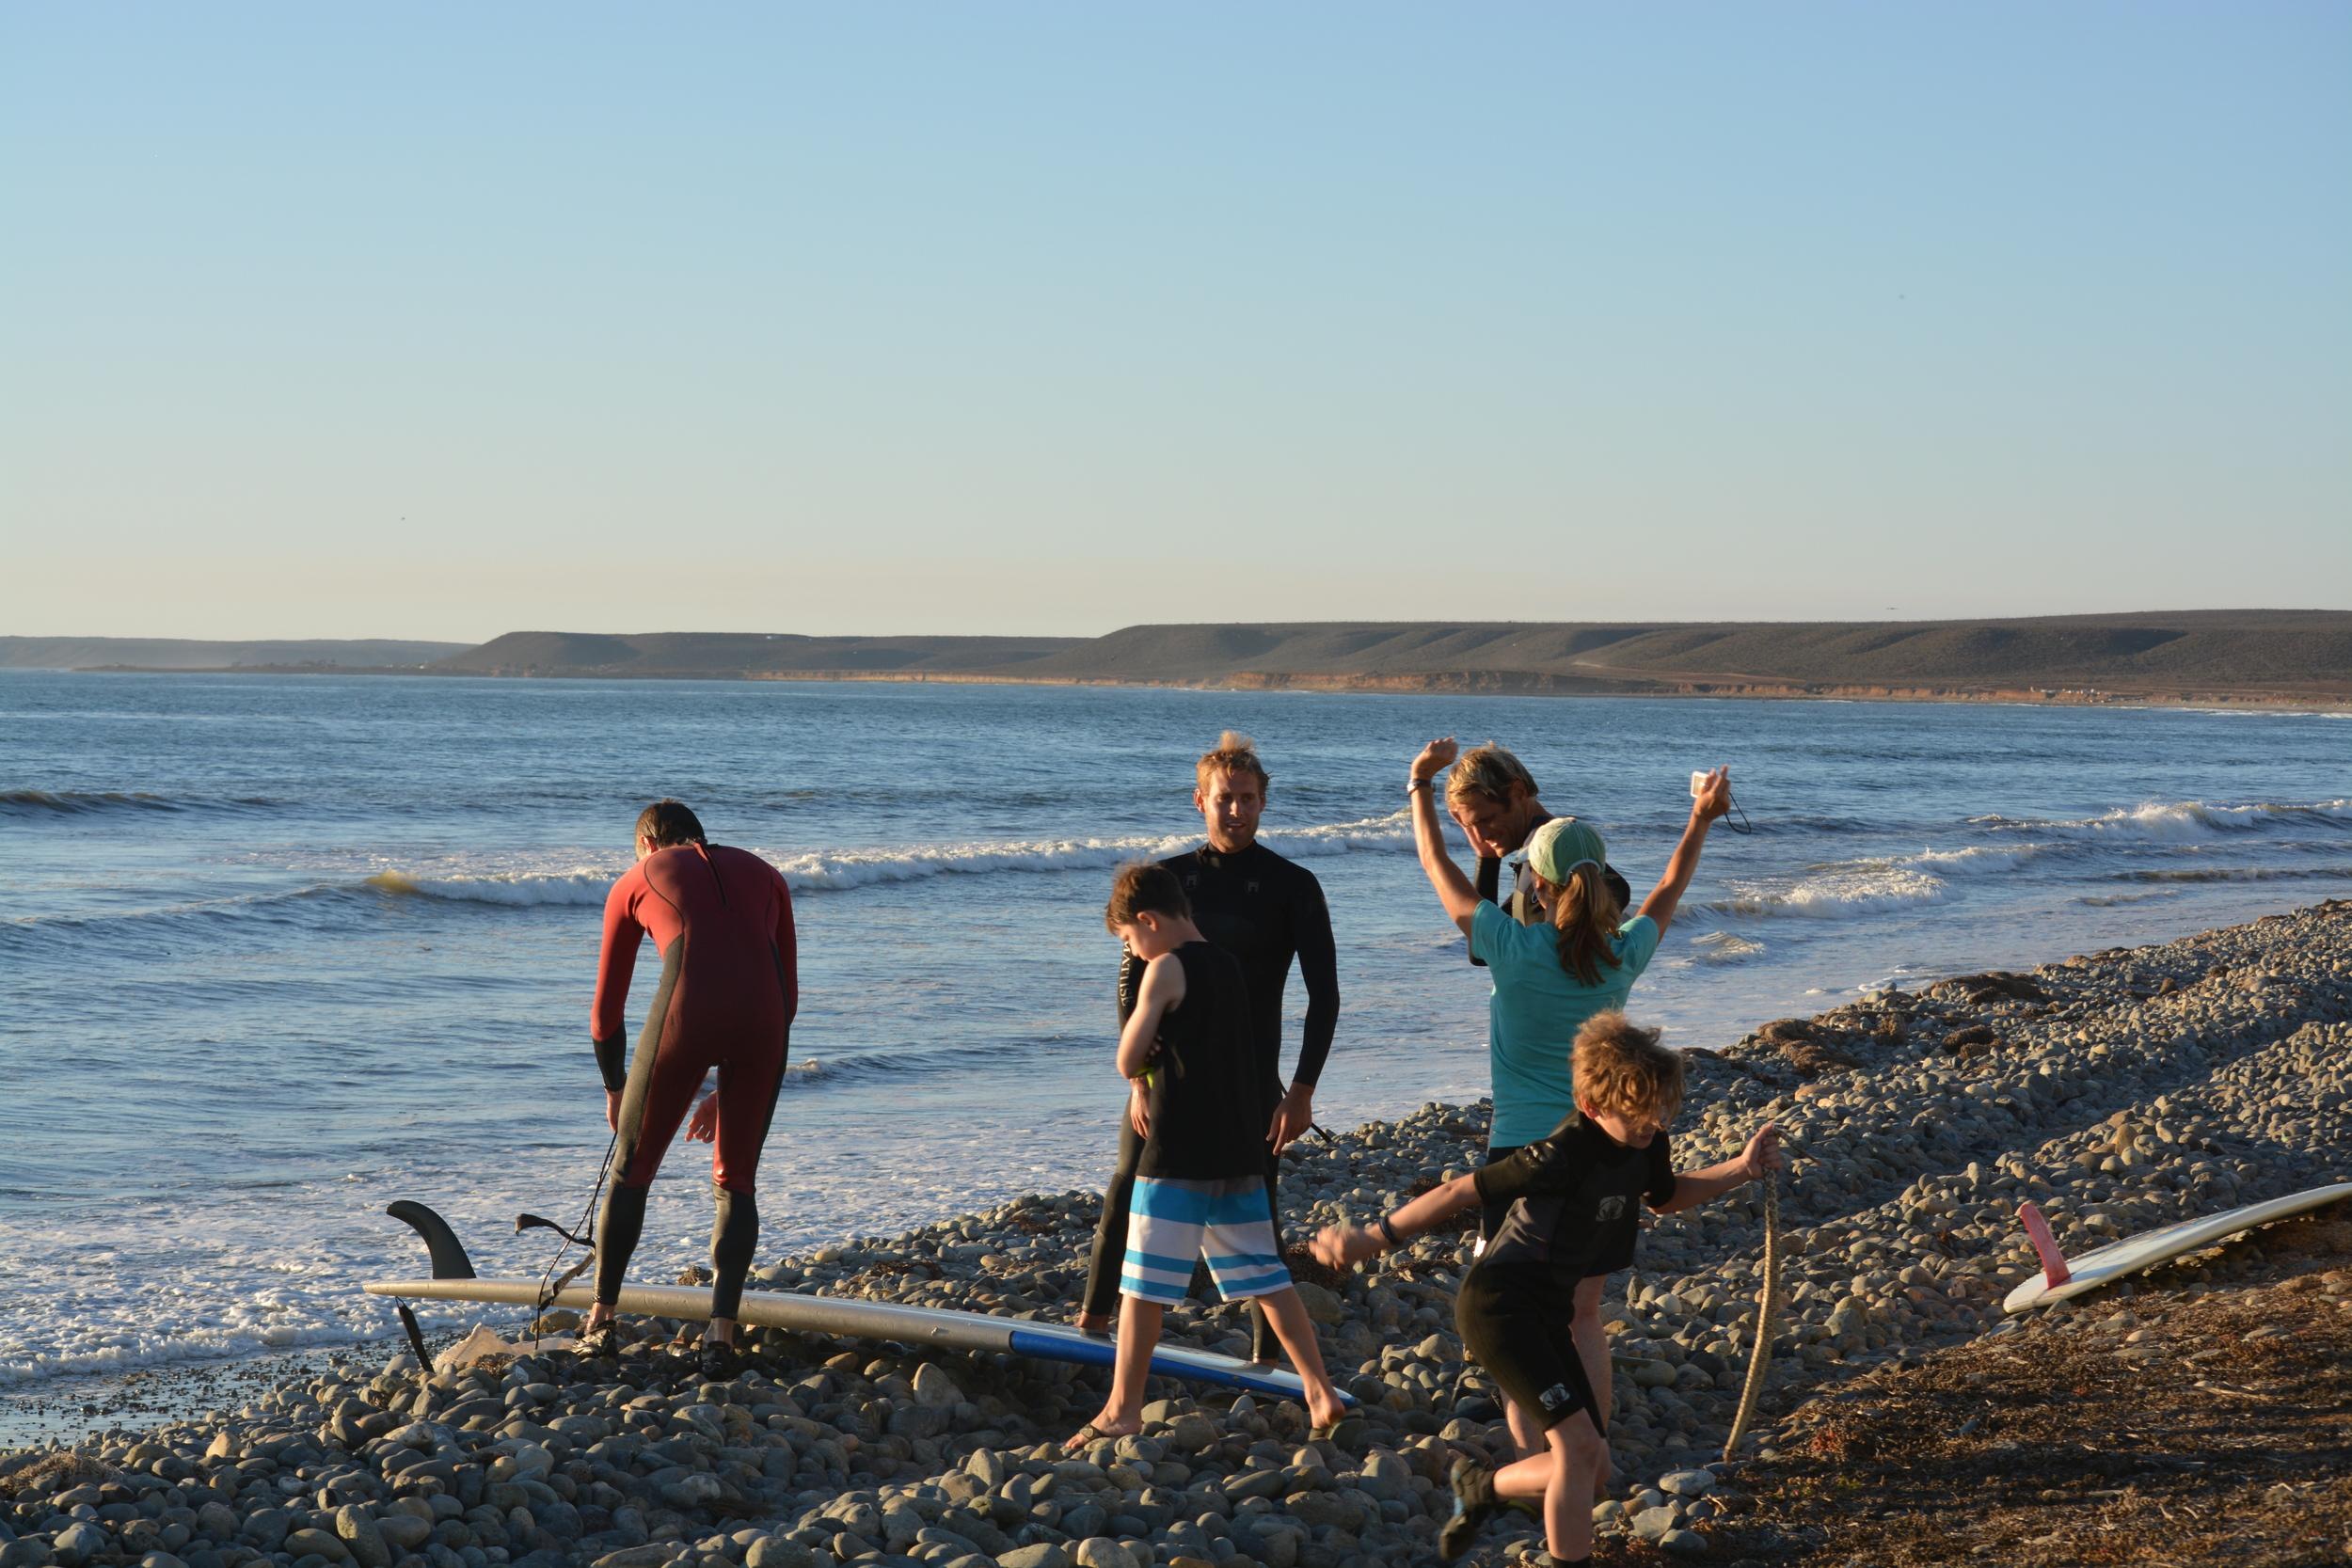 Baja California 10-5-13 Shipwrecks Surfing Adventure Ocean Experience Surf School San Diego (108).JPG